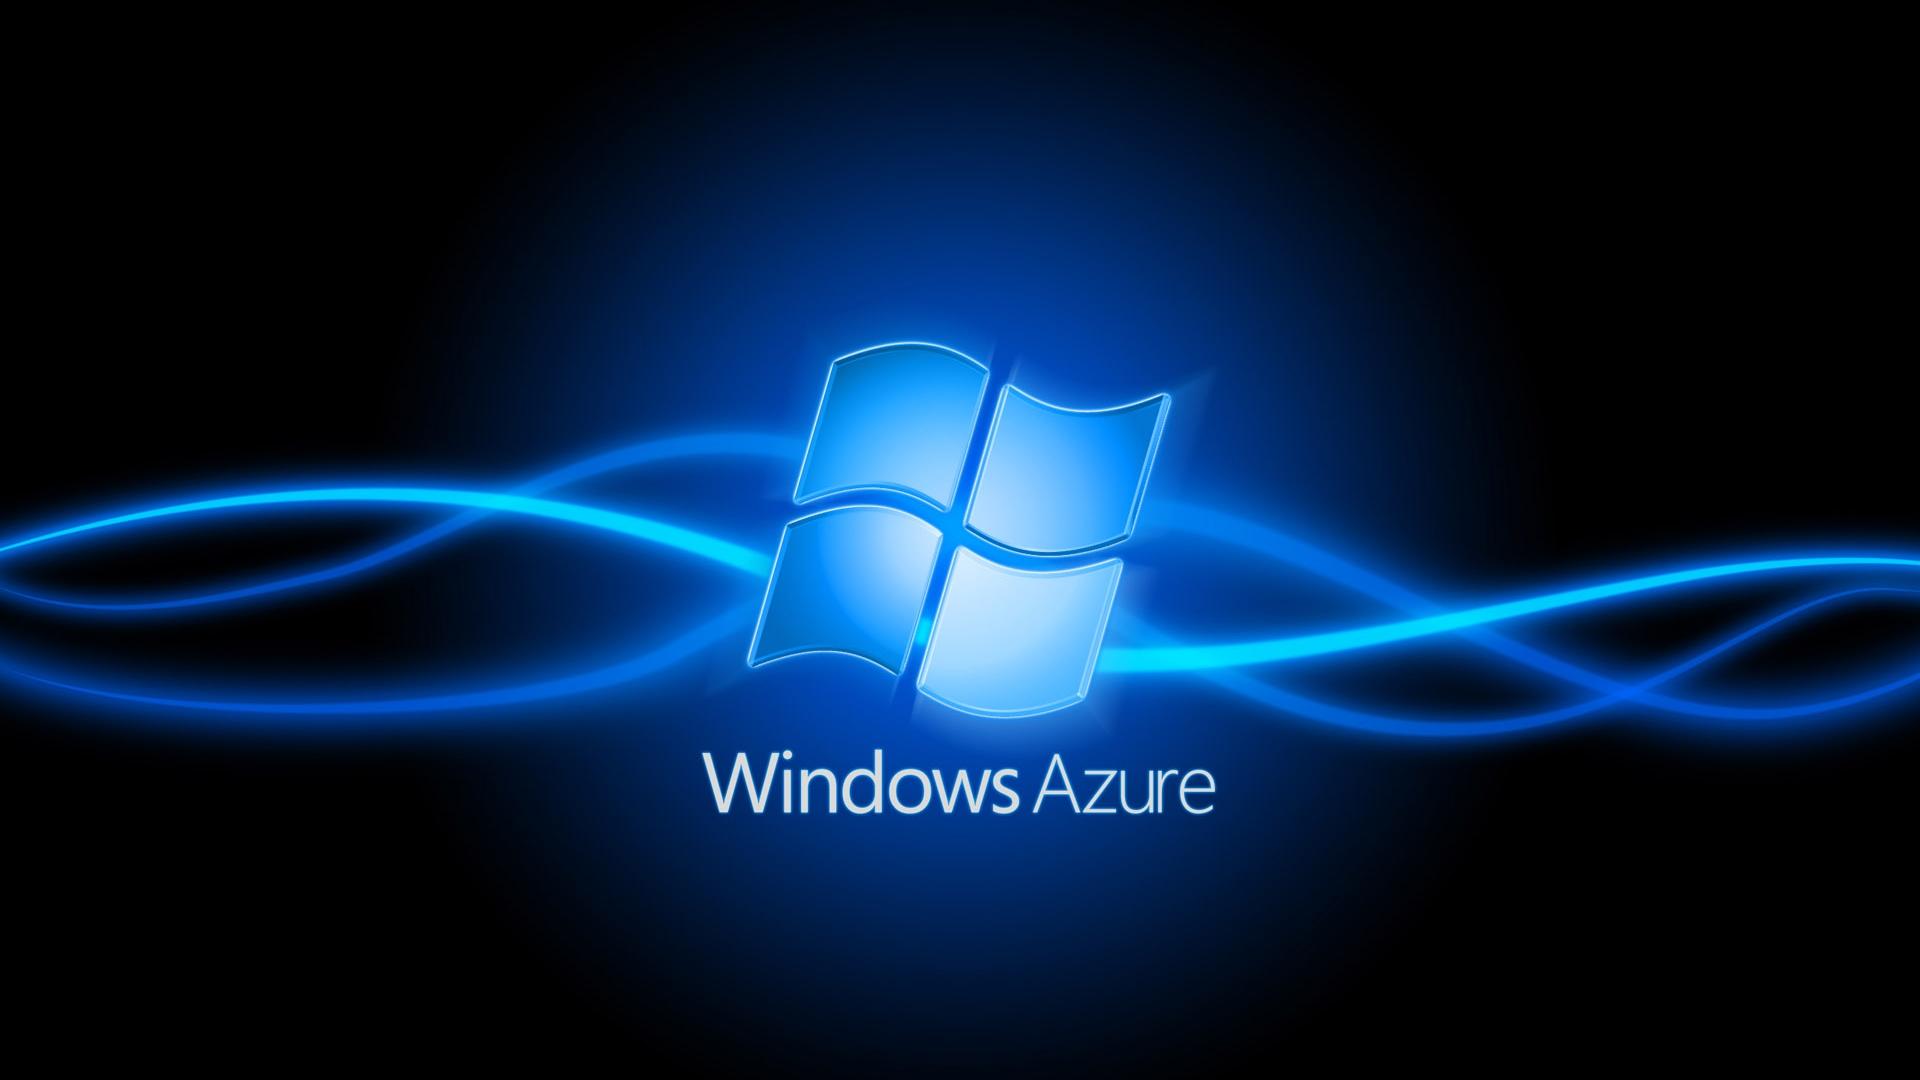 Windows 10 logo animated wallpaper wallpapersafari - Windows animated wallpaper ...